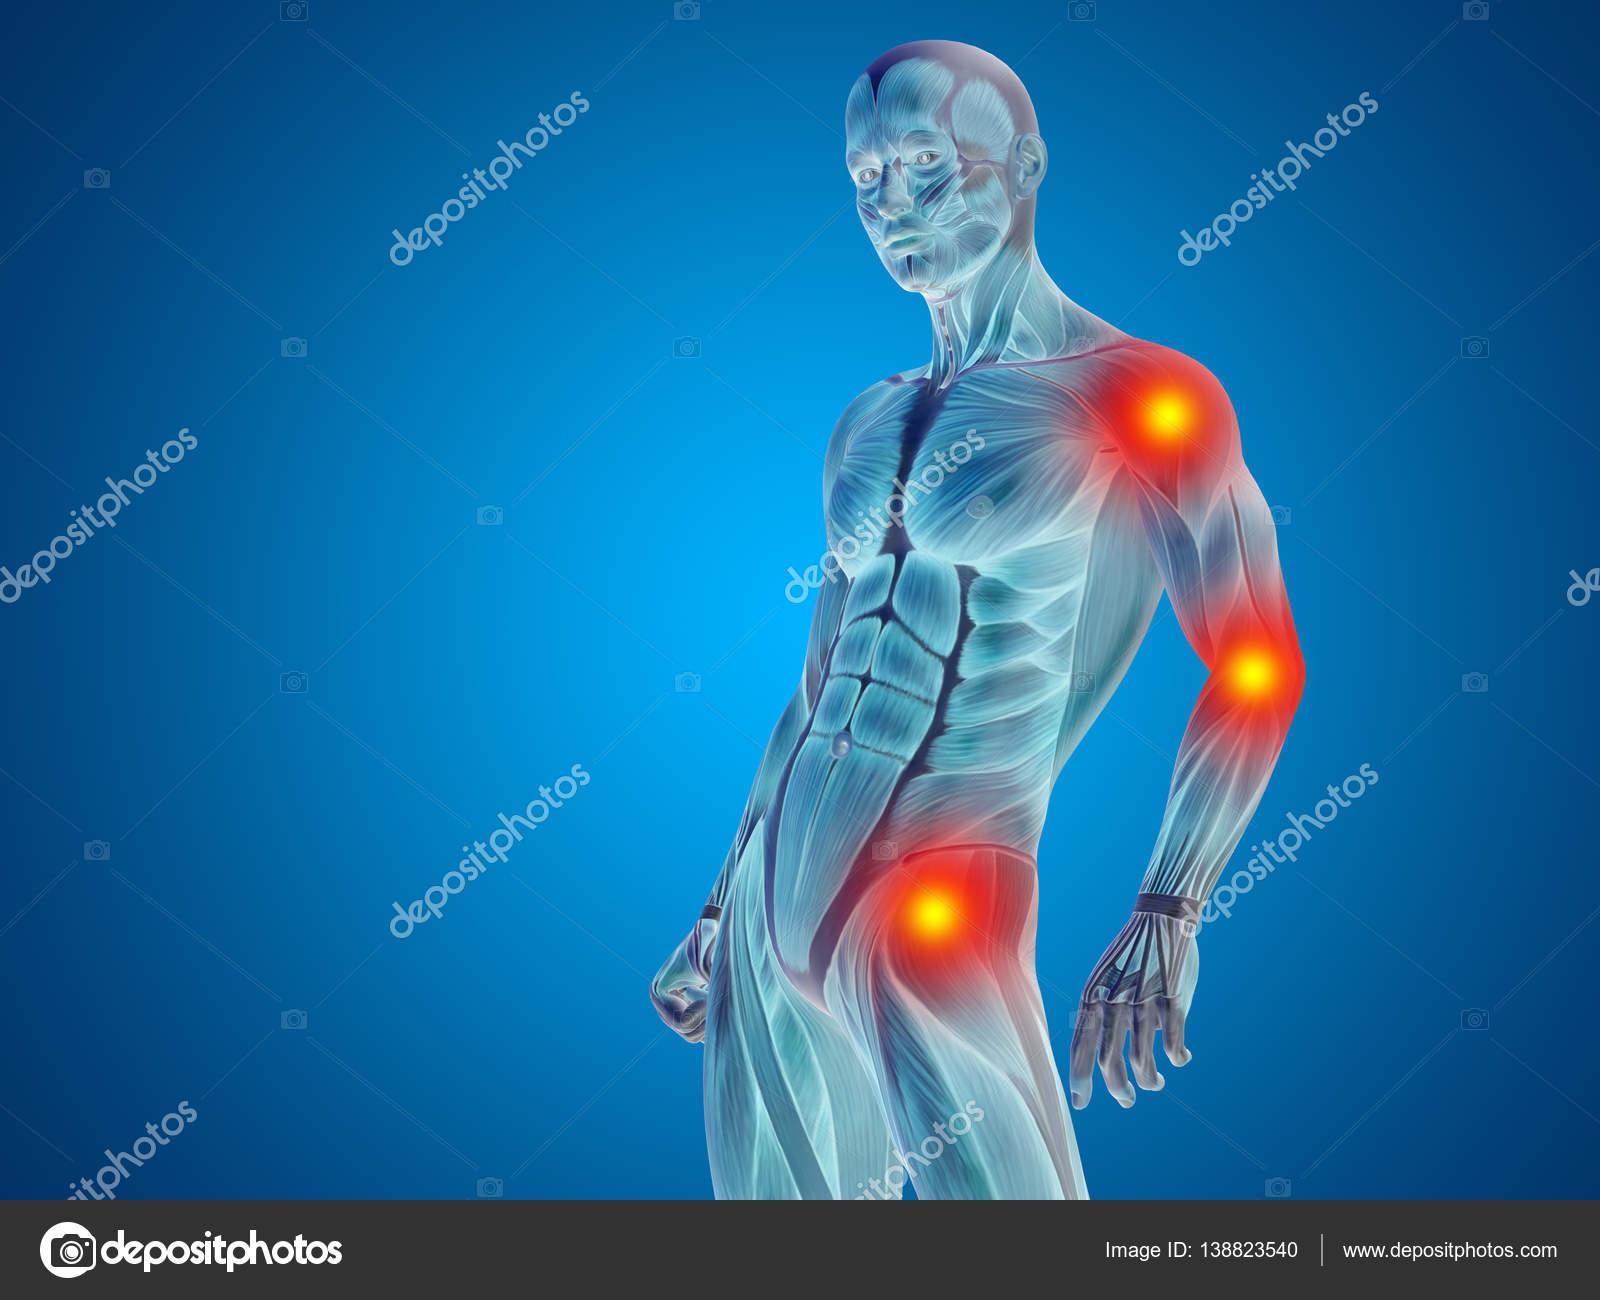 Human Upper Body Anatomy Stock Photo Design36 138823540